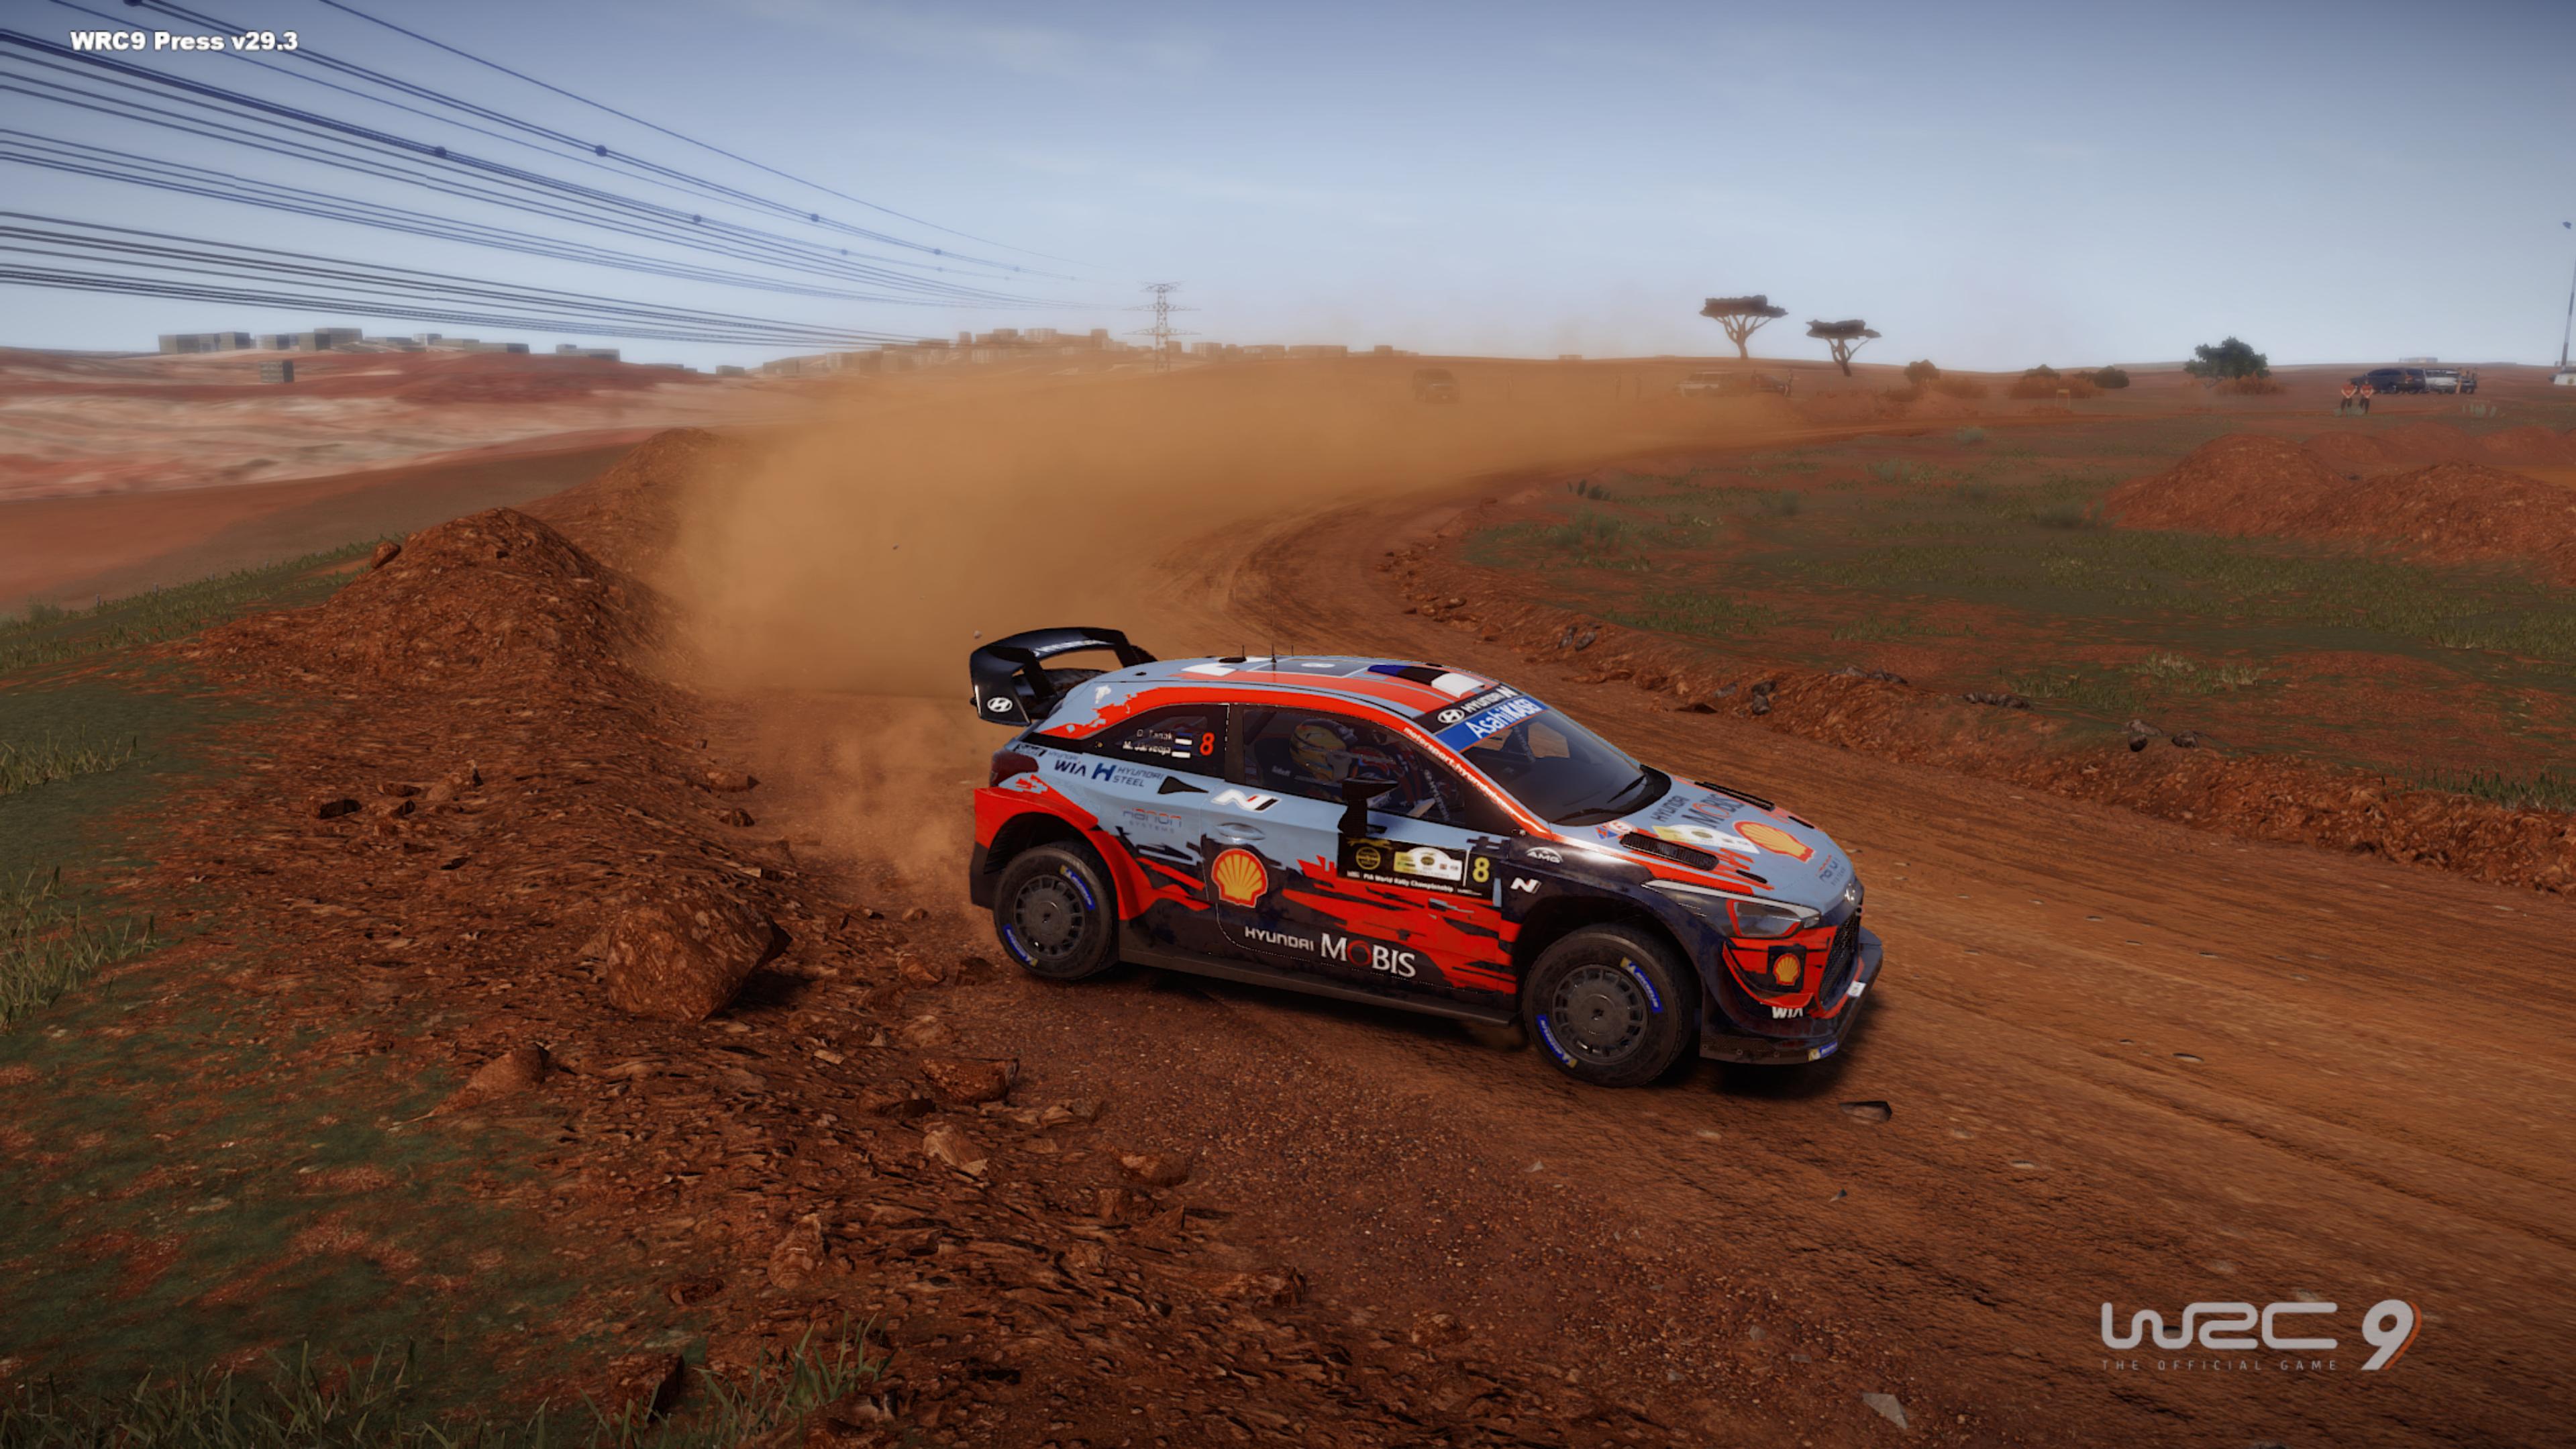 WRC9 7_31_2020 10_17_36 AM